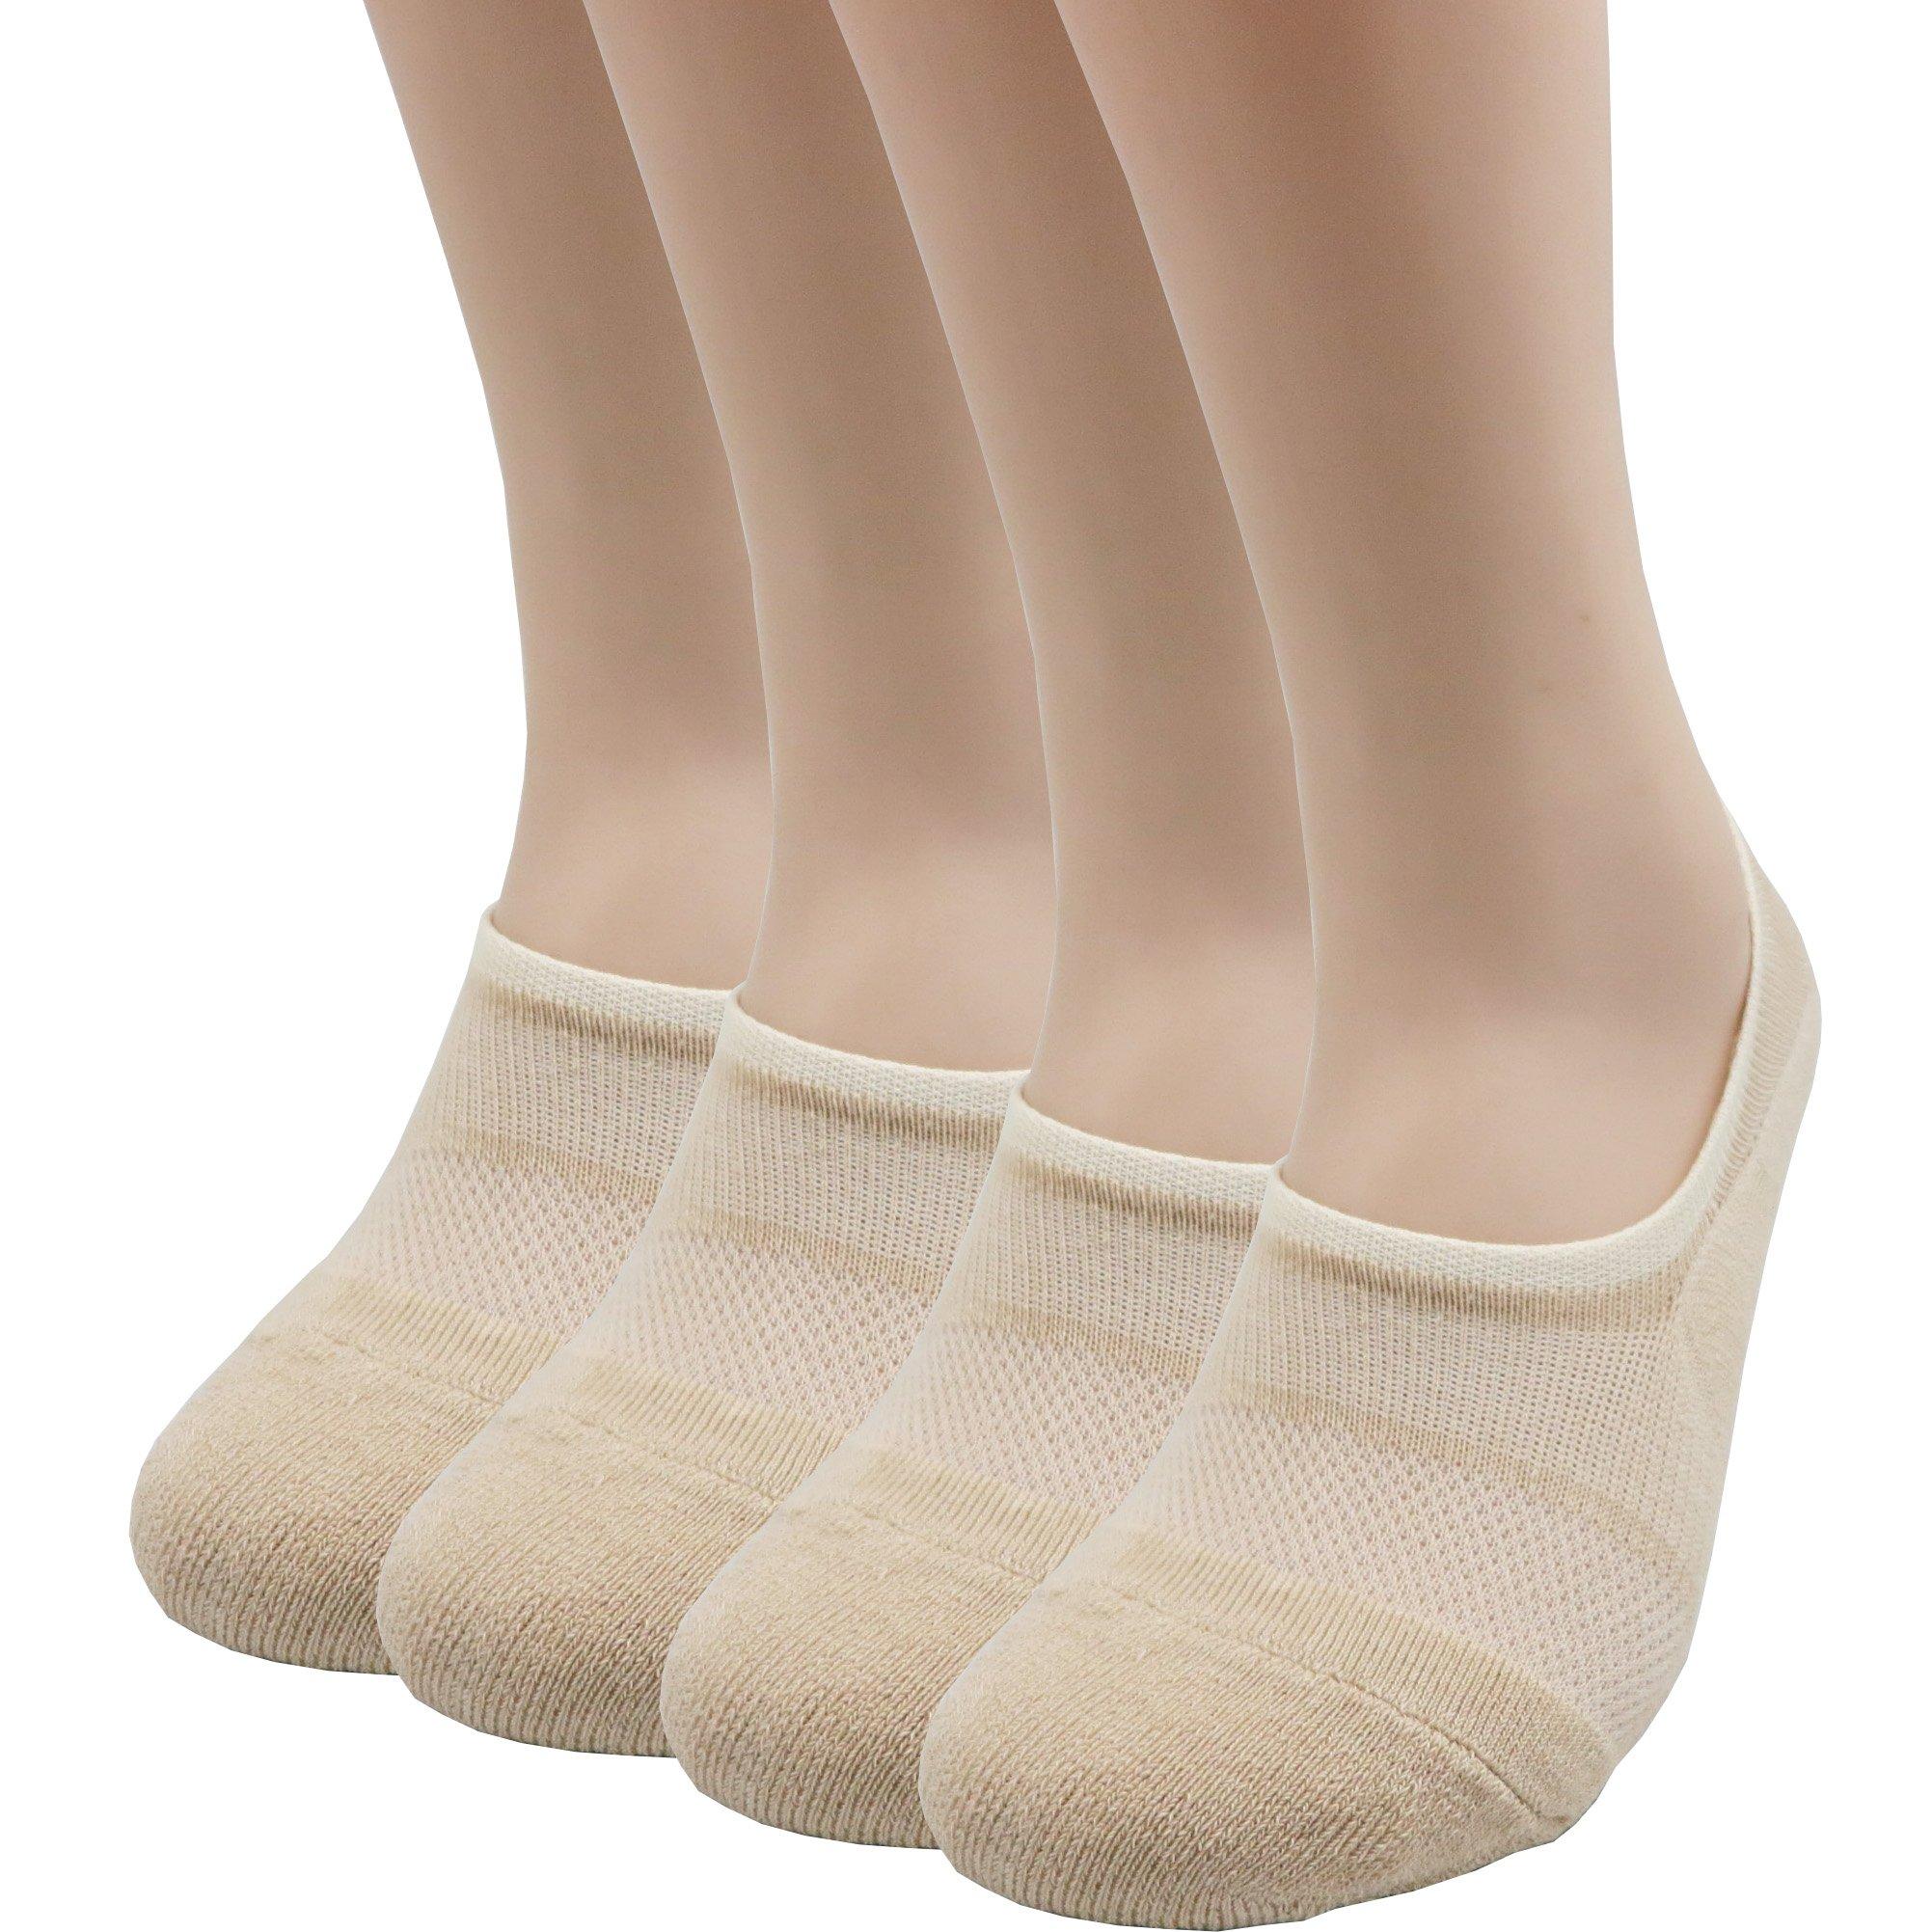 Pro Mountain Men's Women's No Show Flat Cushion Athletic Cotton Footies Sneakers Sports Socks (M(US Women Shoe 7.5~9.5 = Men 6.5~8.5, size10 Unisex), Beige 4pairs Pack M-size)